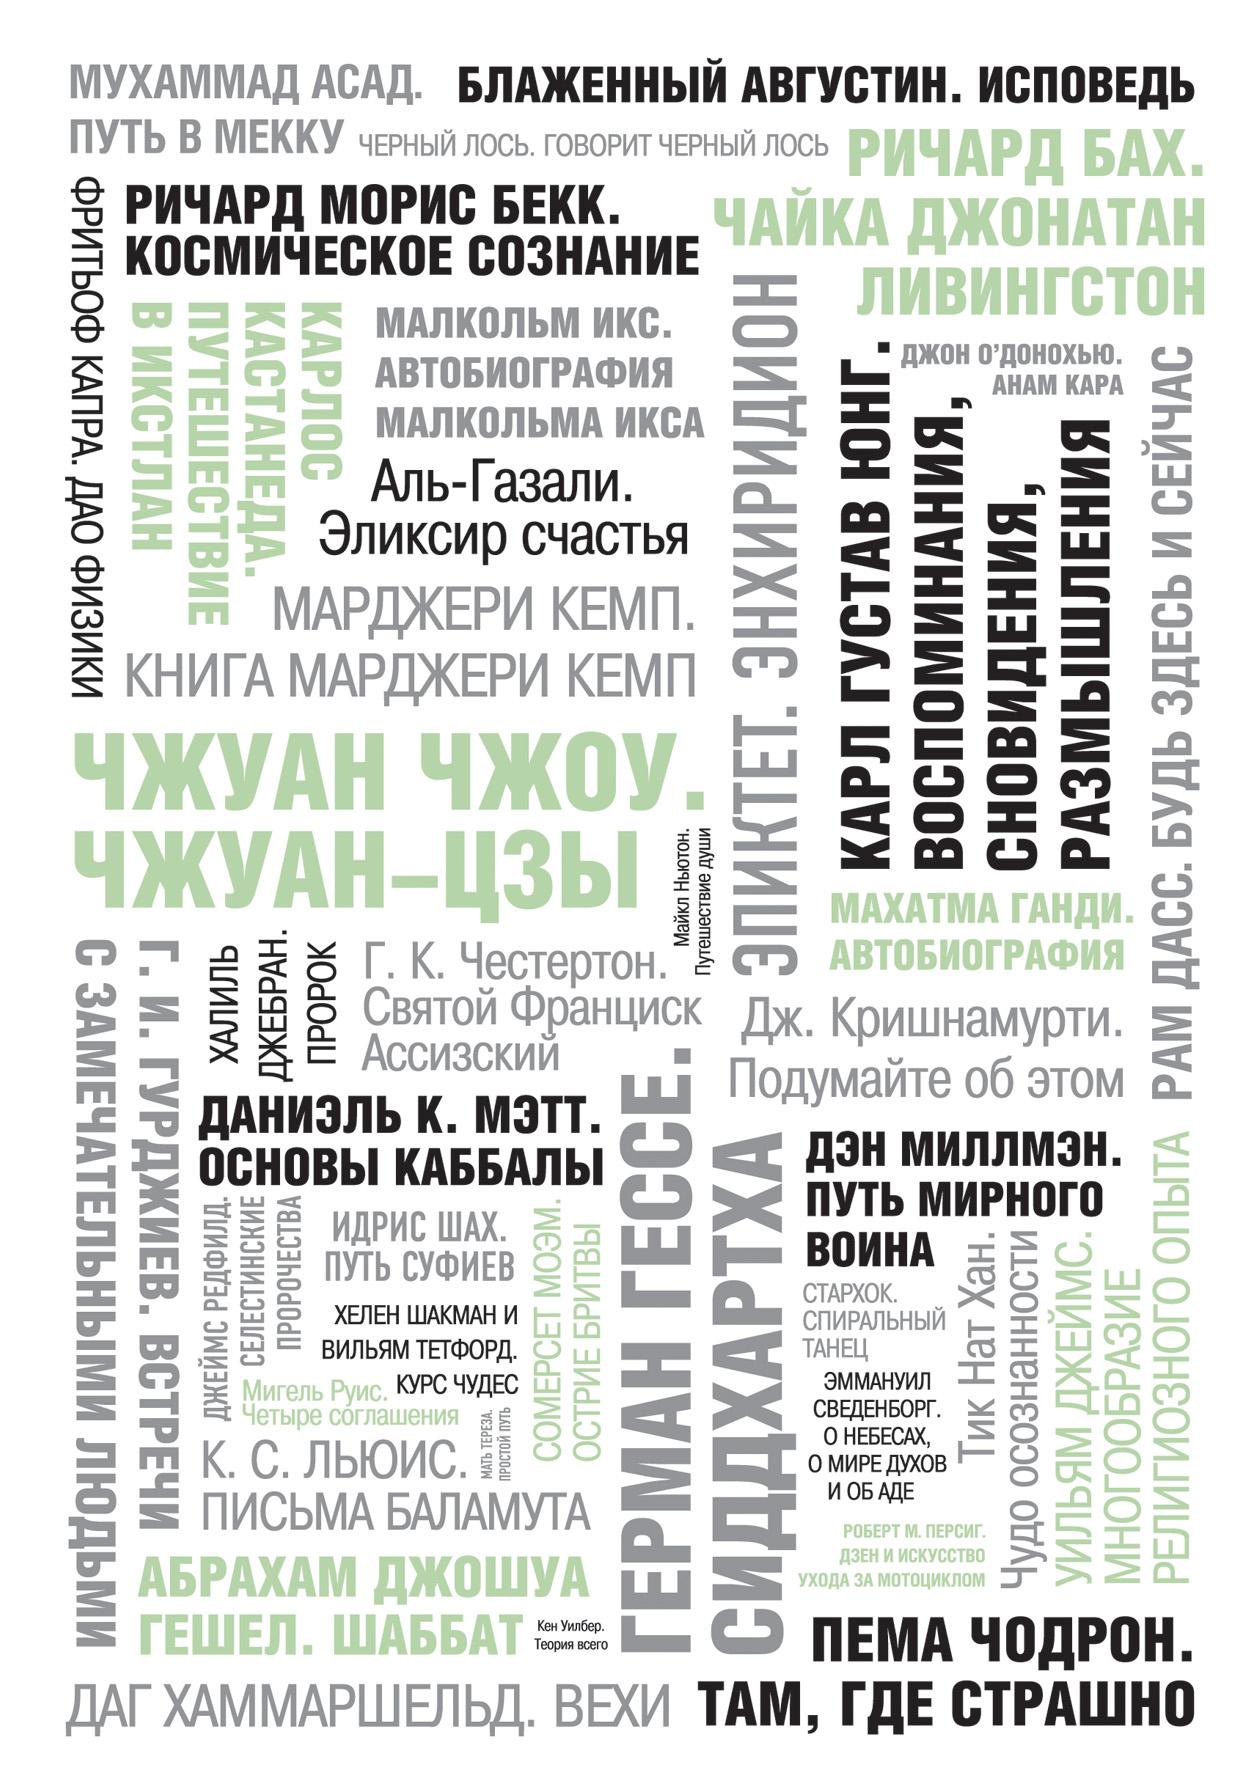 50 великих книг о силе духа